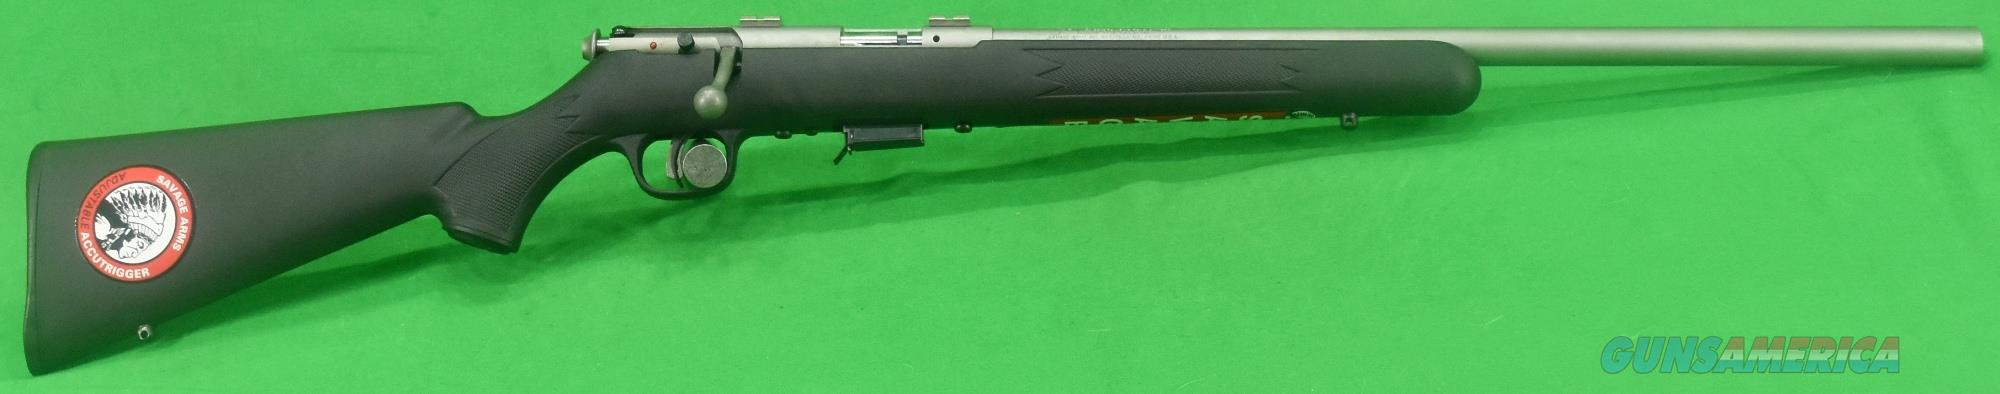 93 FVSS Black Stainless 22WMR 21In  94700  Guns > Rifles > Savage Rifles > Accutrigger Models > Sporting